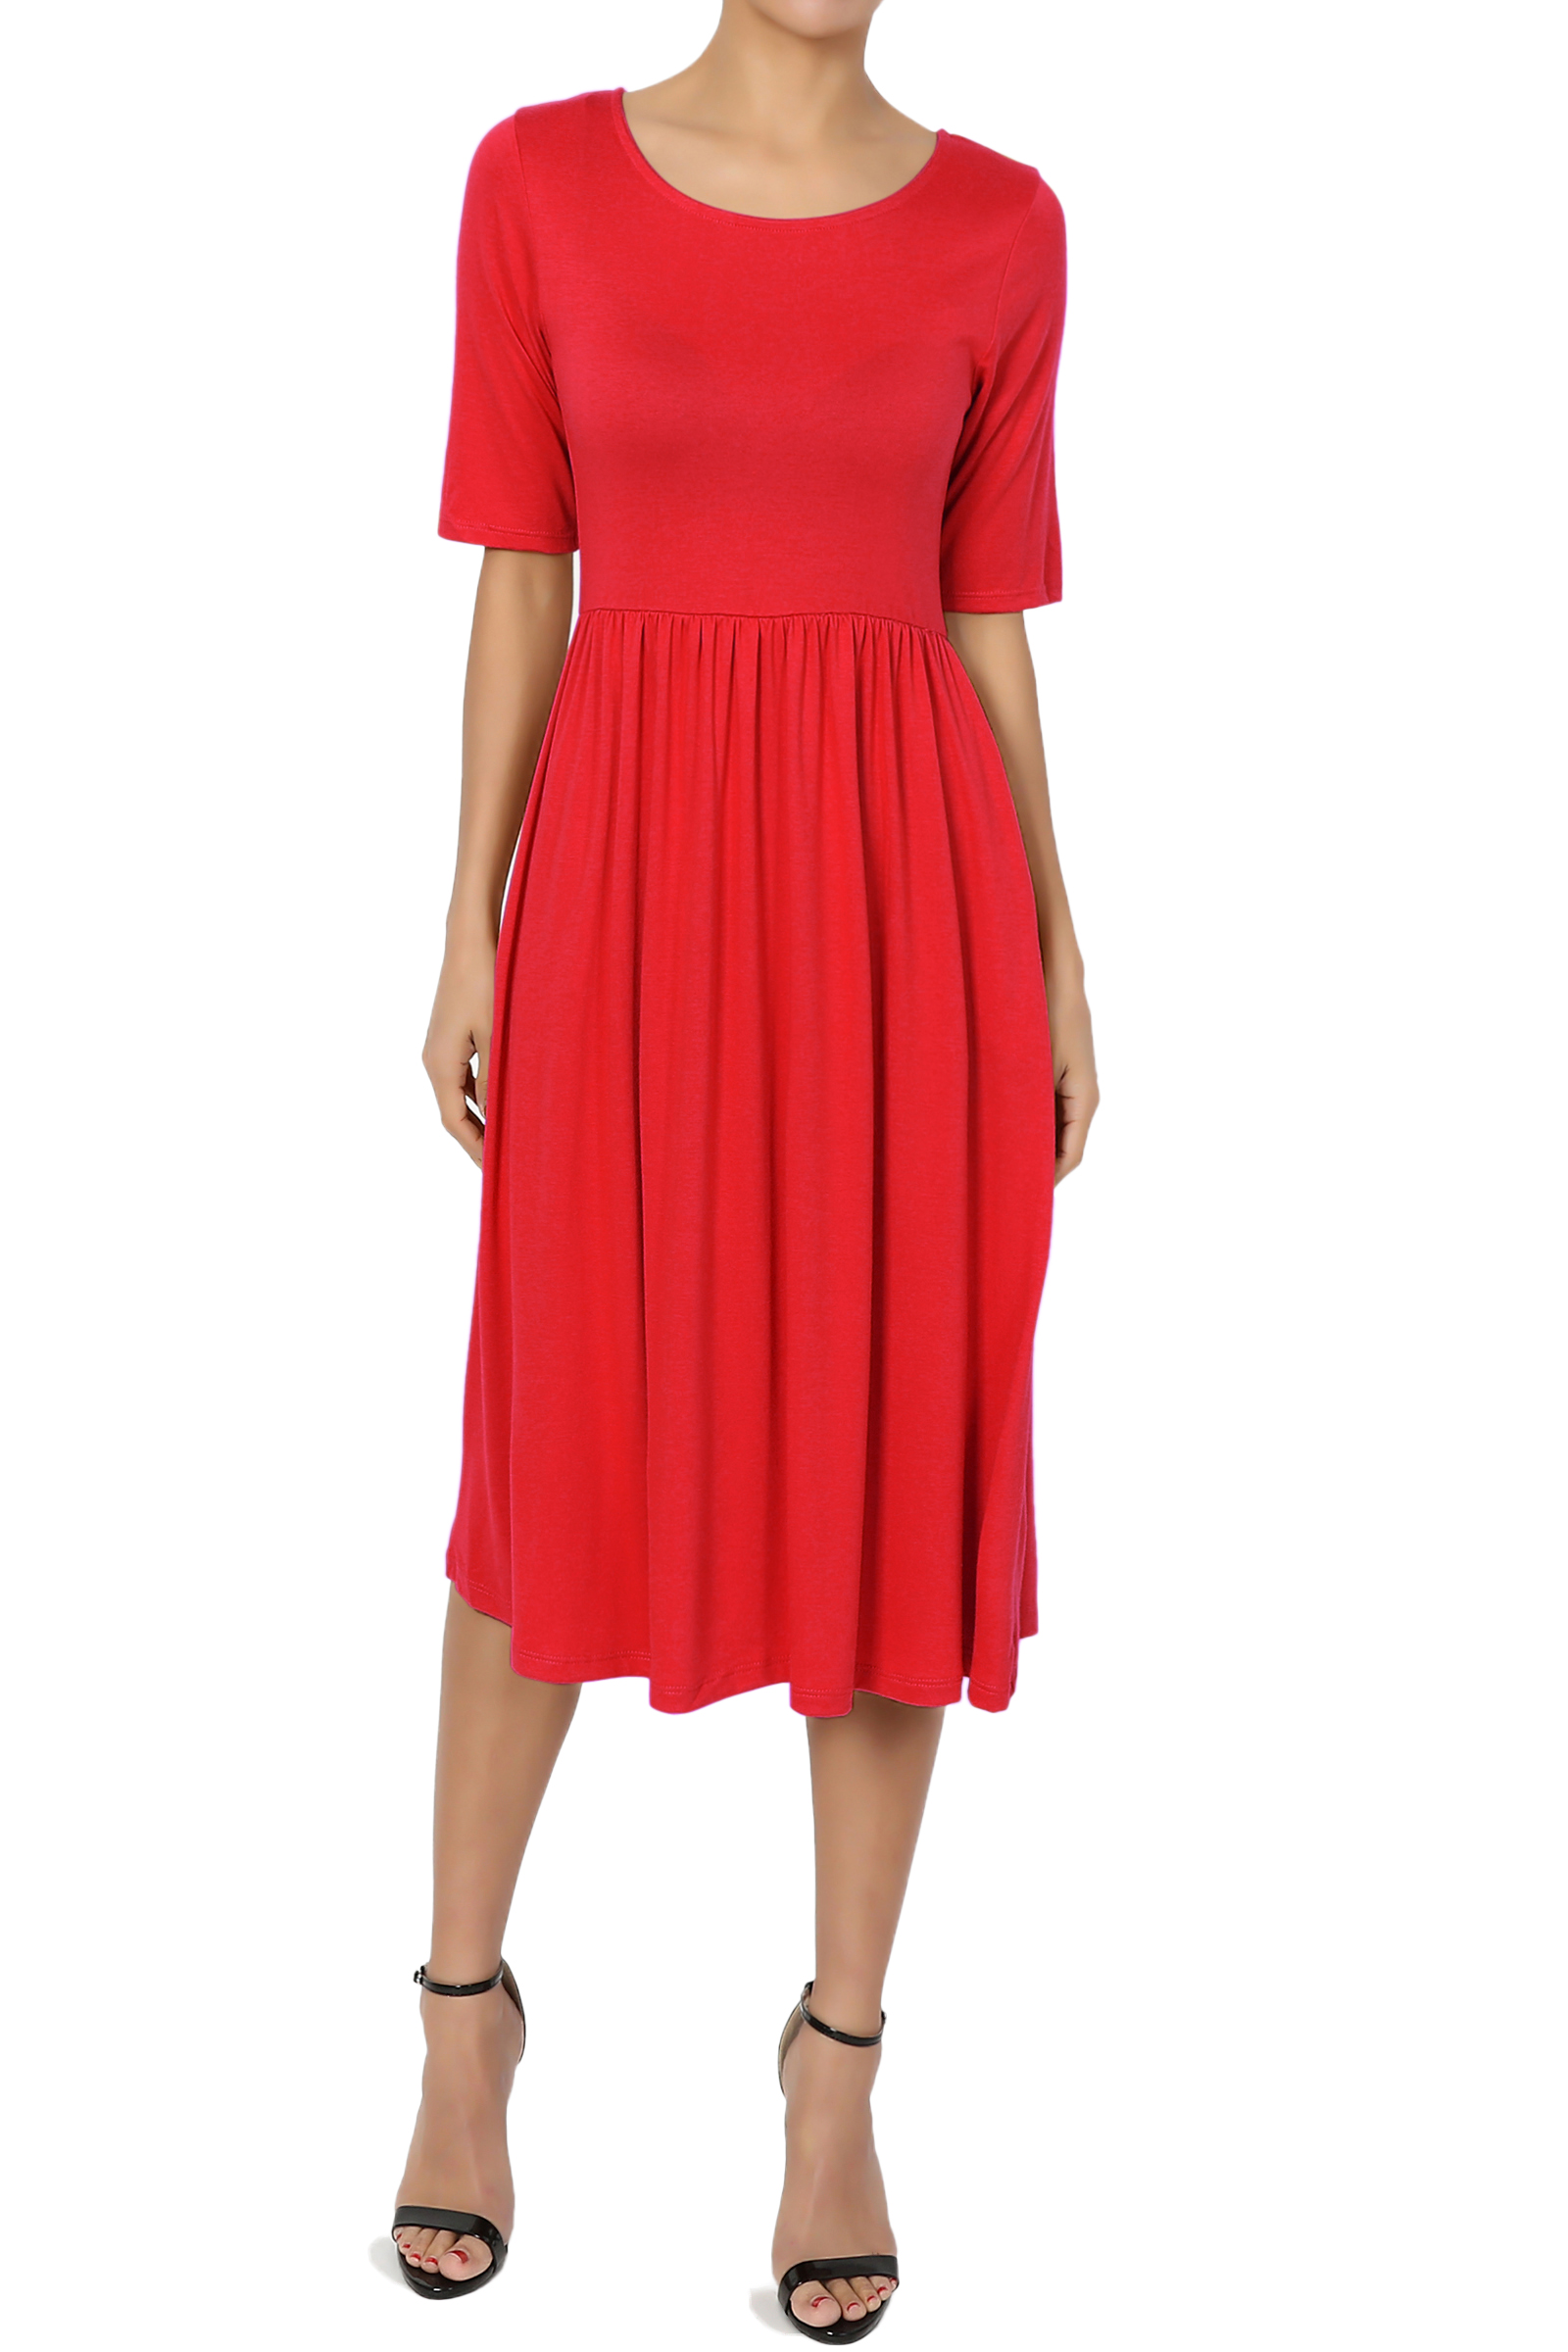 TheMogan Women's PLUS Short Sleeve Pleated Empire Waist Fit & Flare Pocket Dress